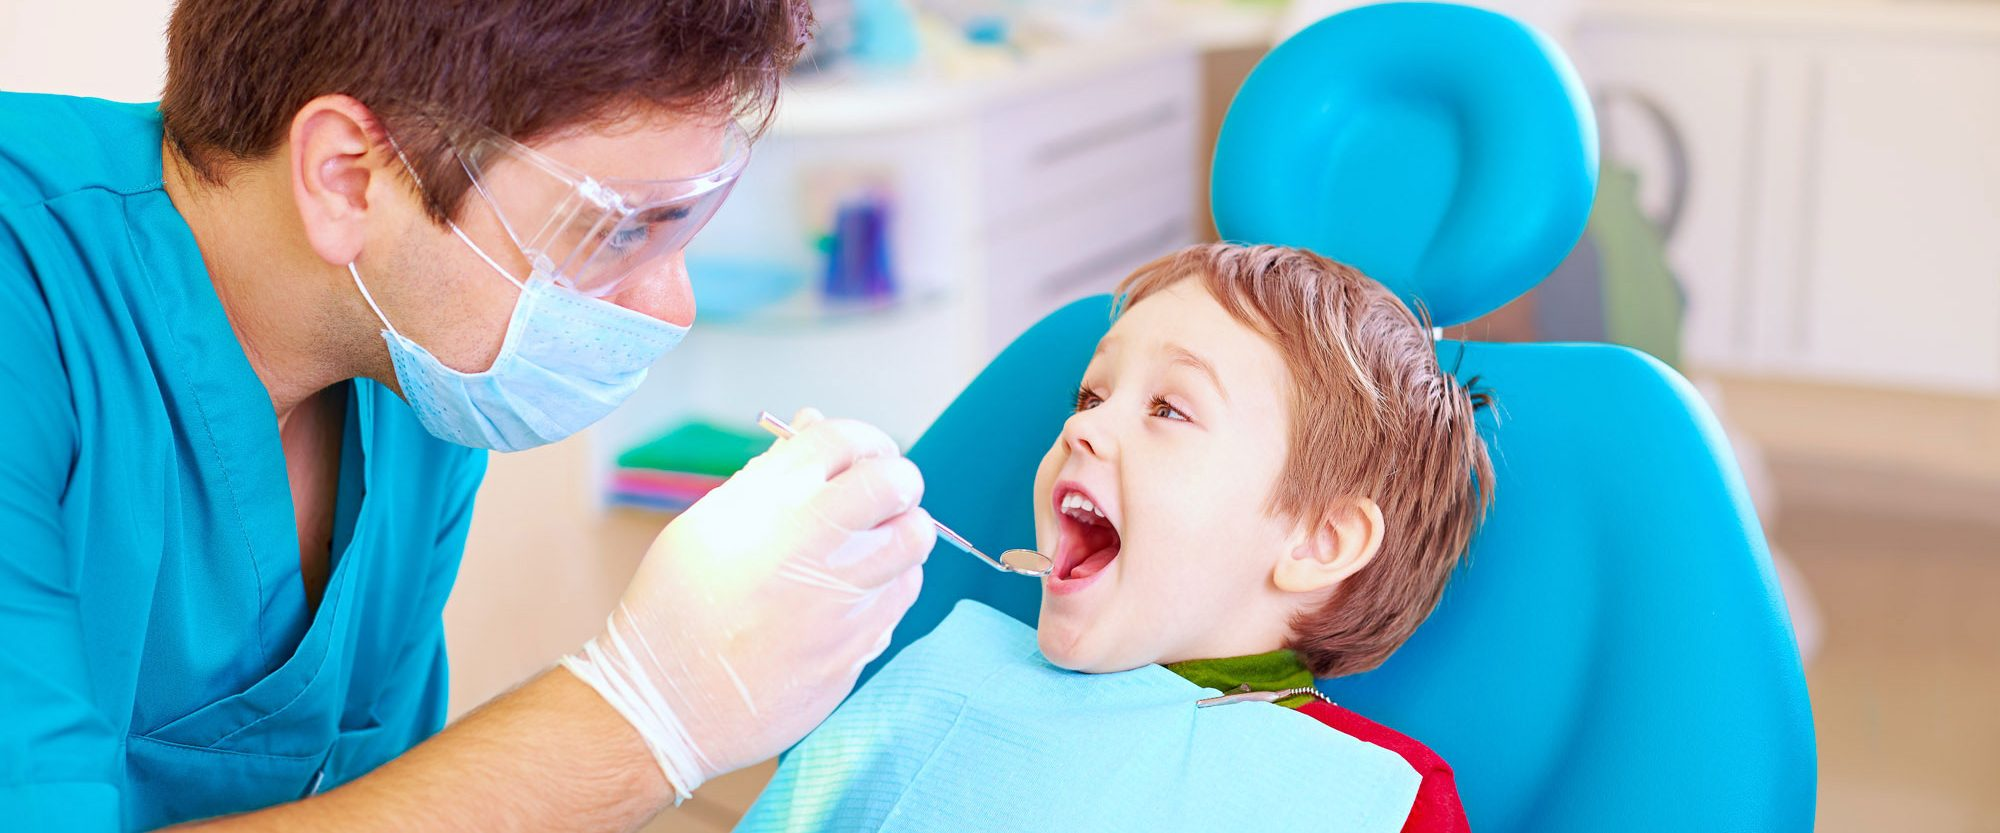 Despre stomatologie - ce se intampla in prezent